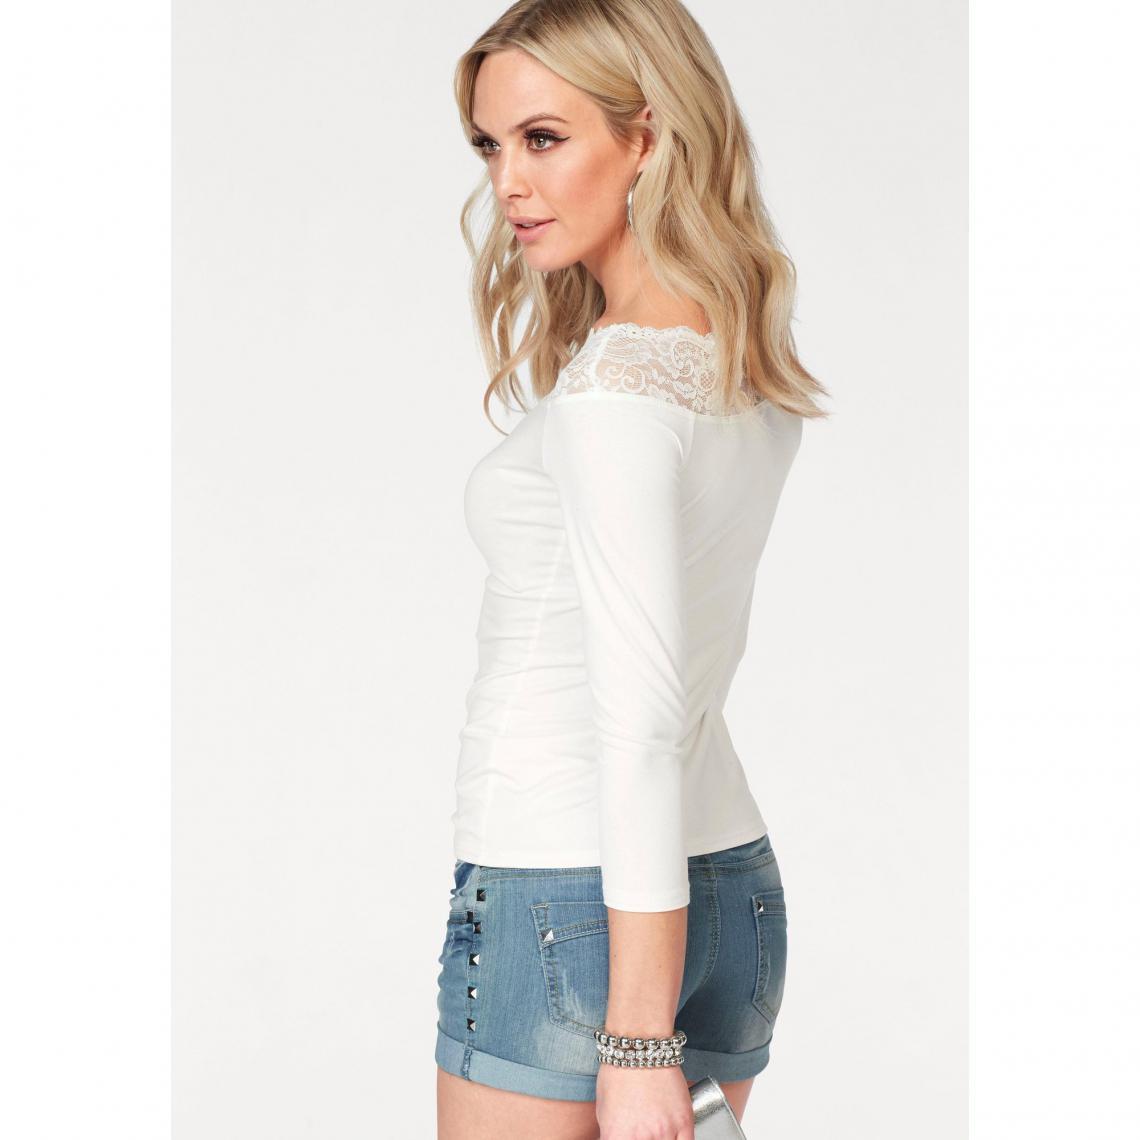 63ffcb9b0c6 Tee-shirt haut dentelle manches ¾ femme Melrose - Blanc